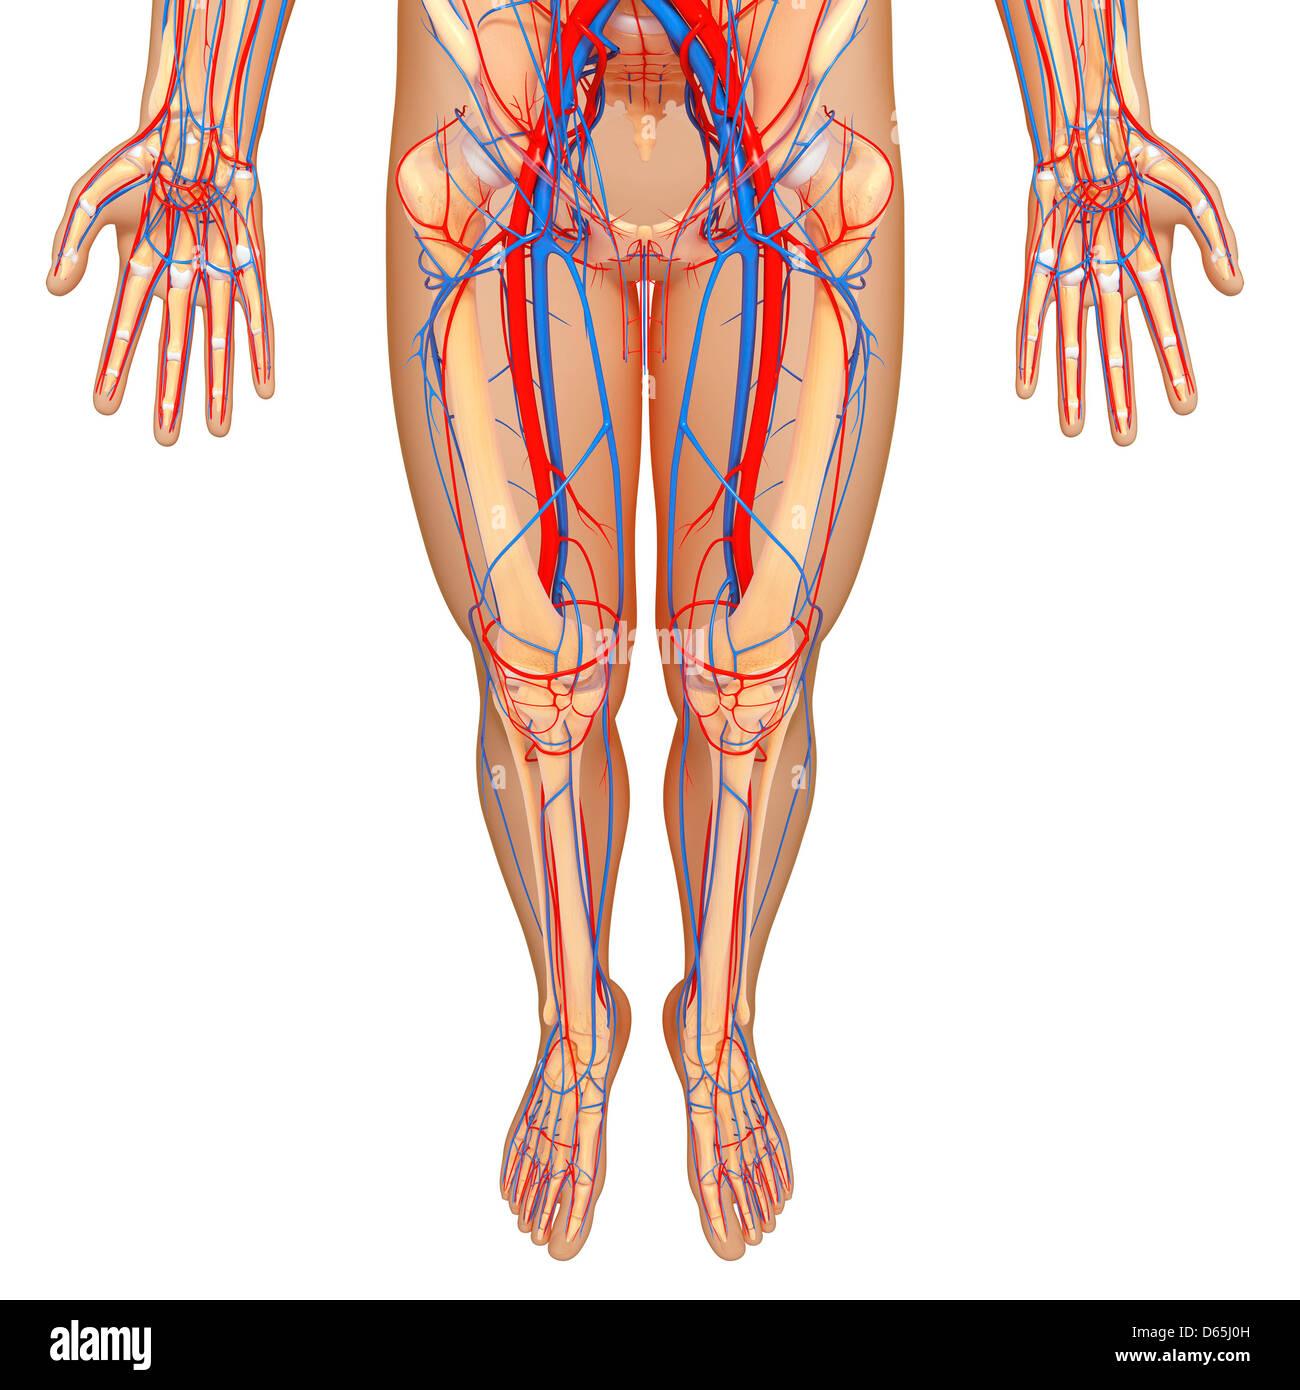 hight resolution of lower body anatomy artwork stock image